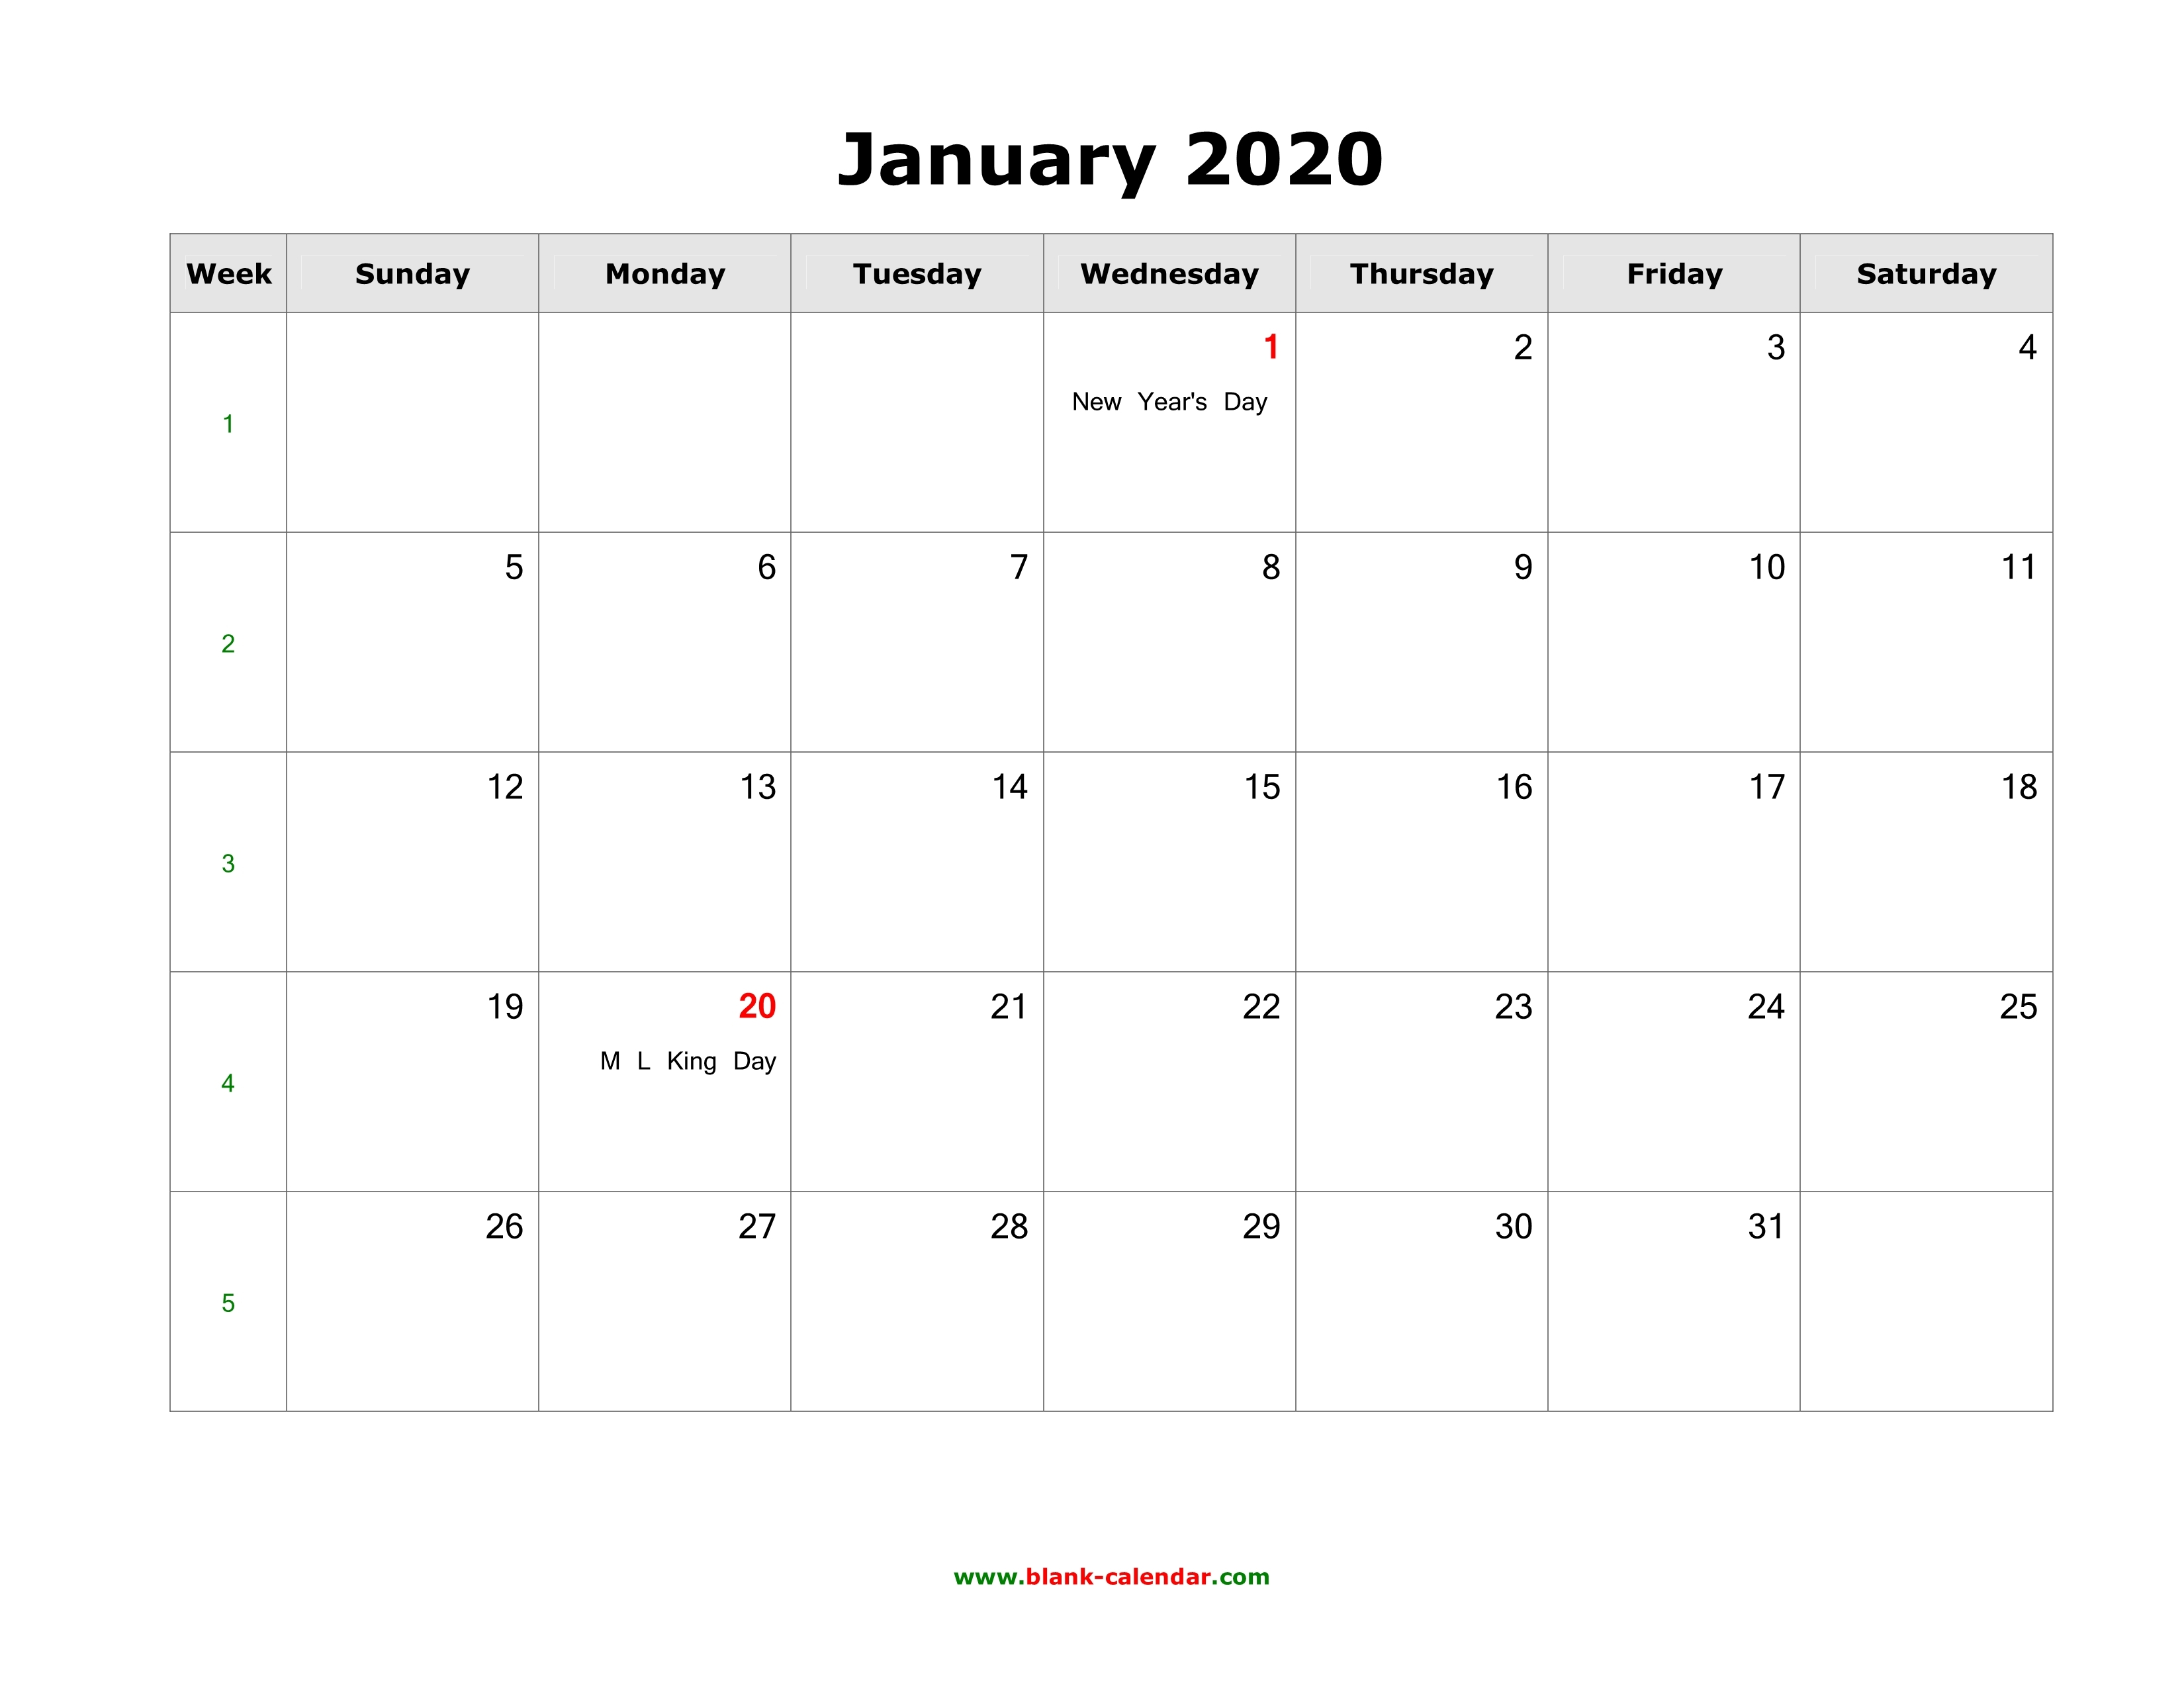 January 2020 Blank Calendar Free Download Calendar Templates